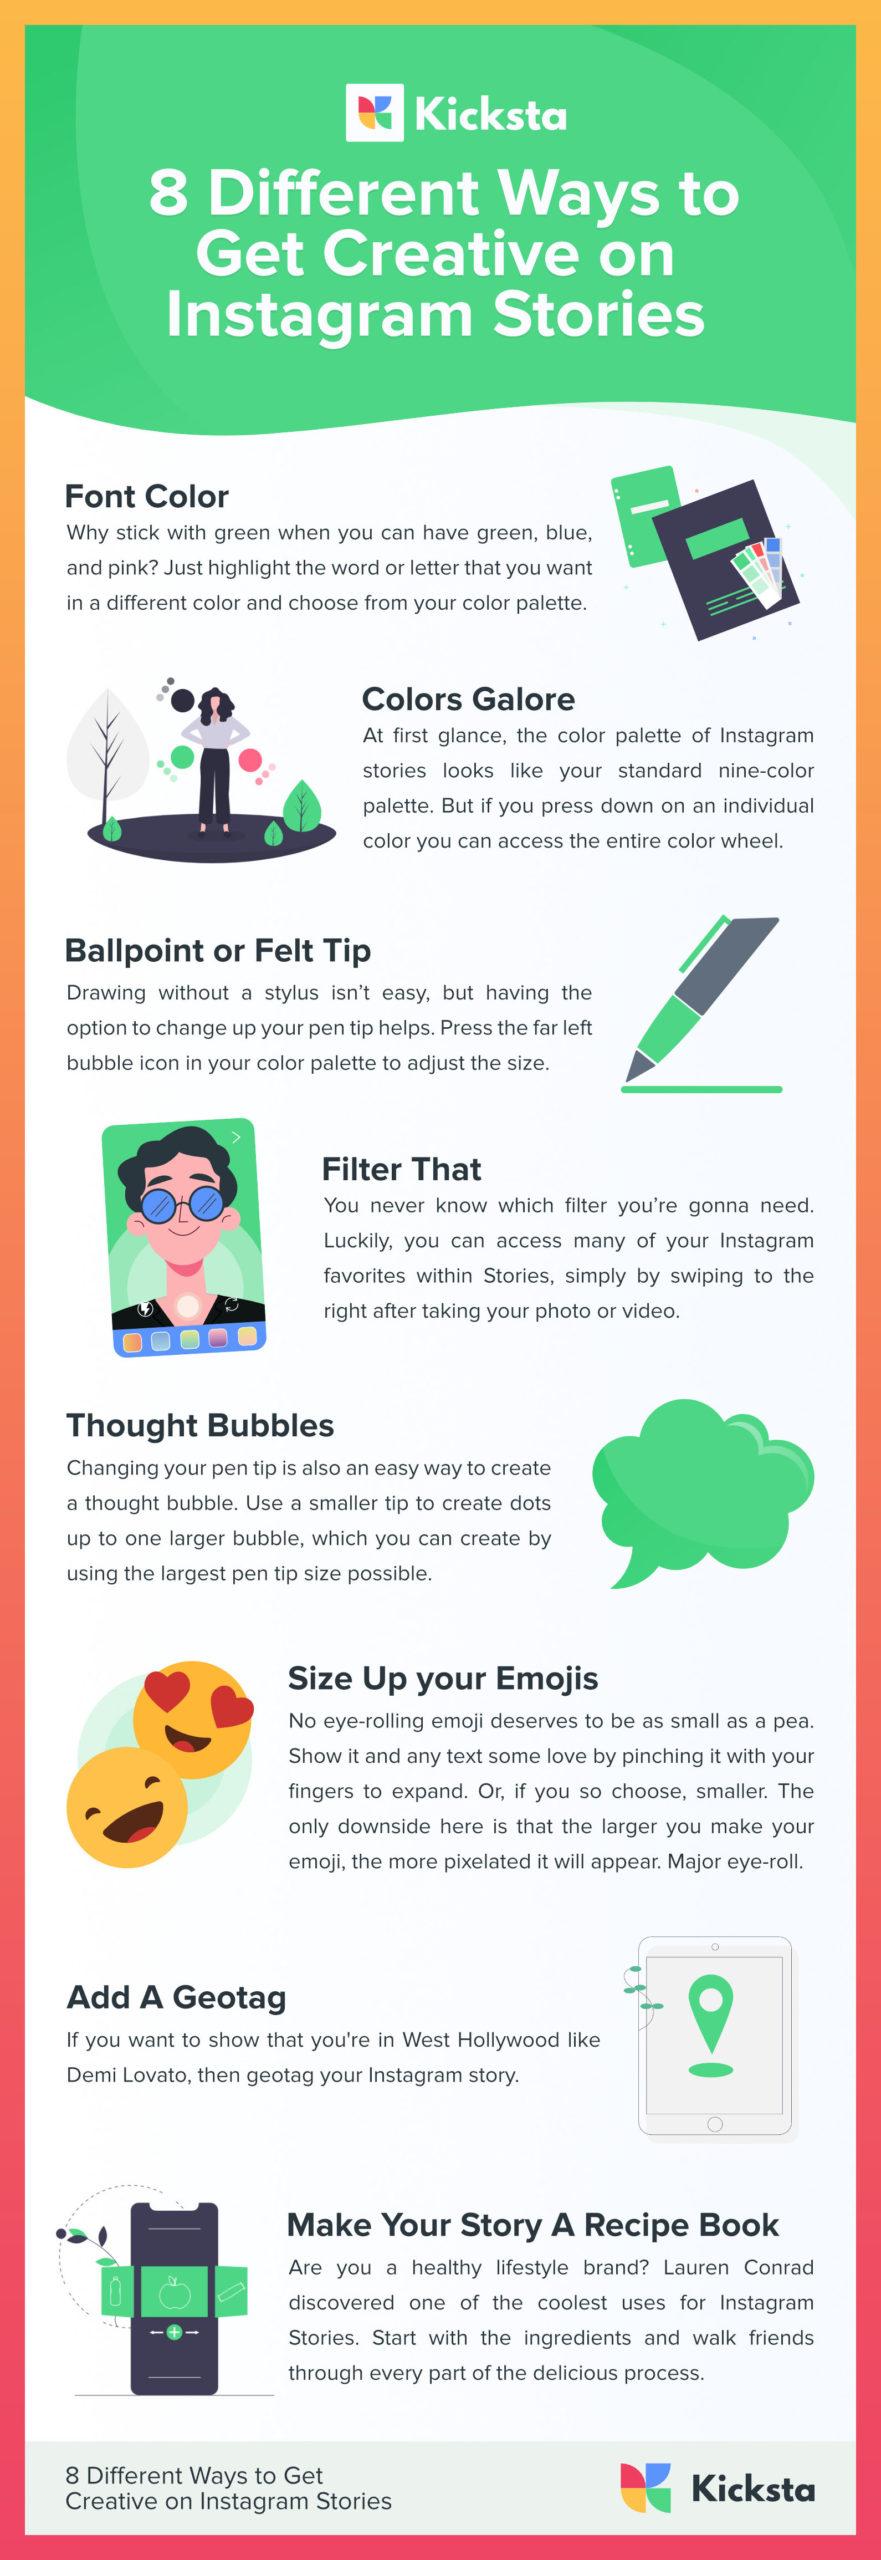 Creative-Instagram-Stories-infographic-plaza